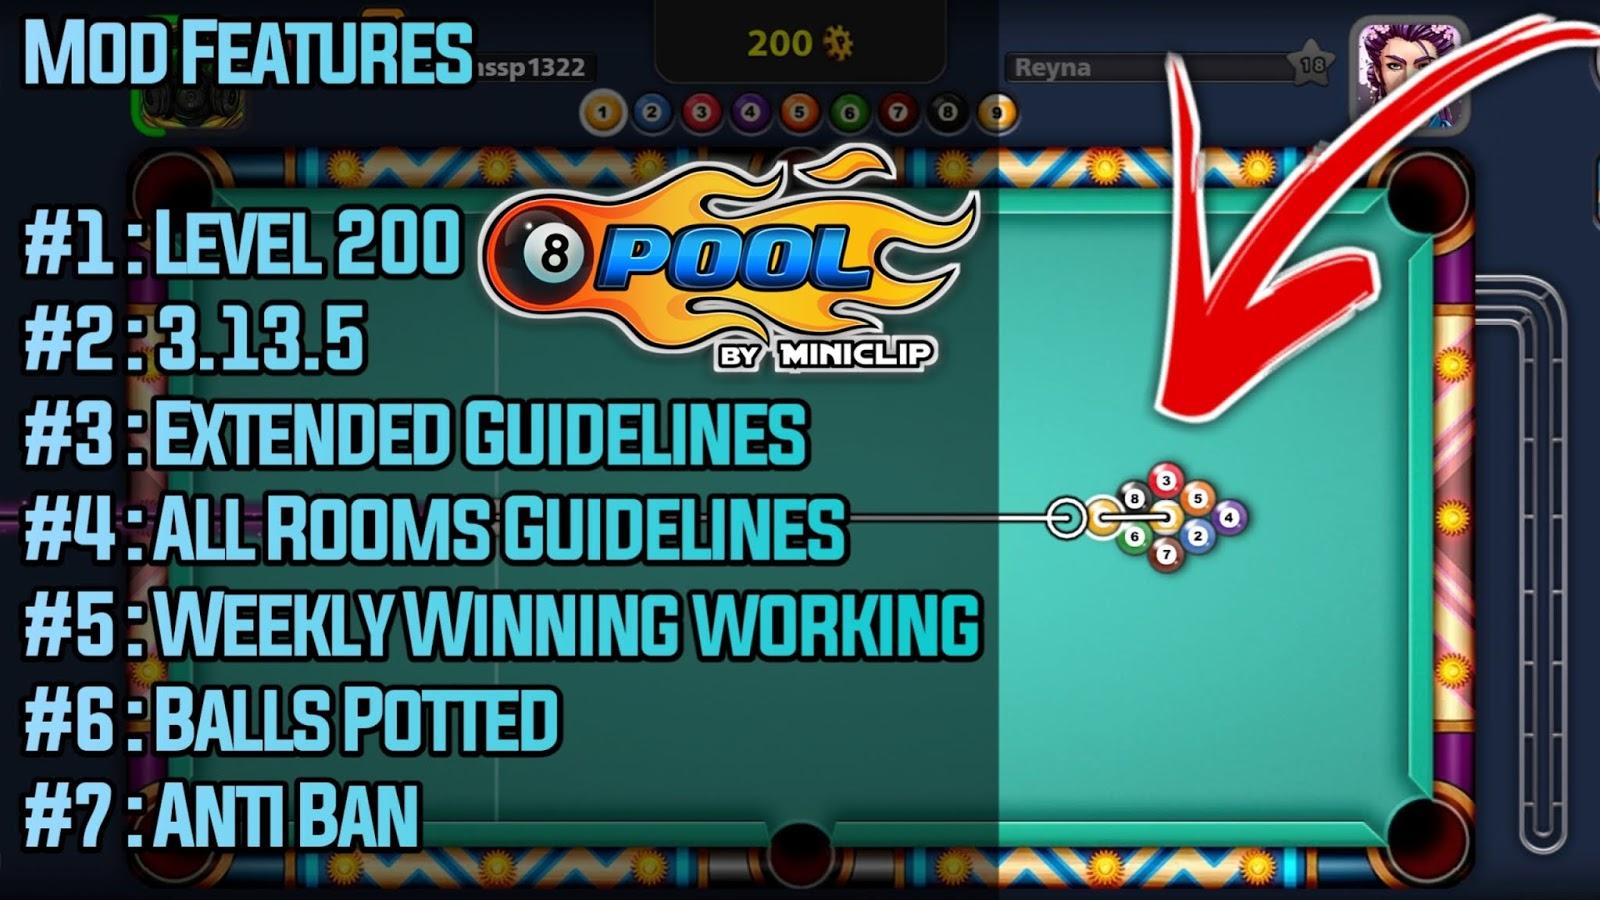 Download 8 Ball Pool Mod Apk- Get Unlimited[Mods/Money/Cheats]